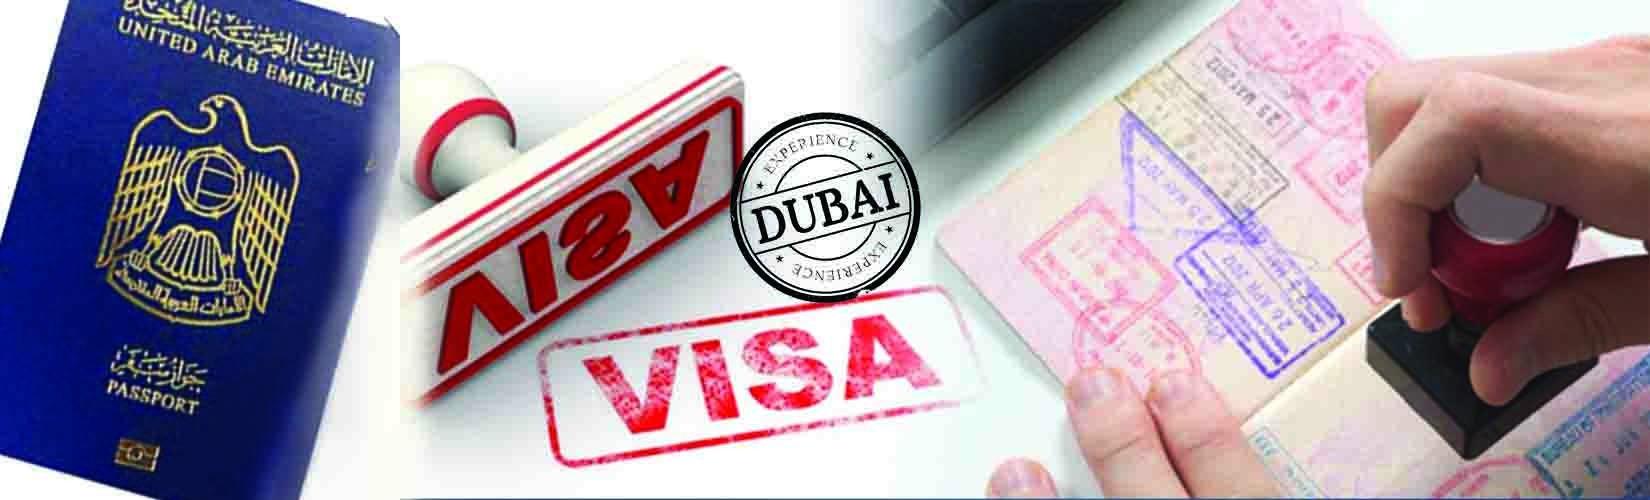 Dubai Travel Info: Complete Dubai Tourist Visa Information